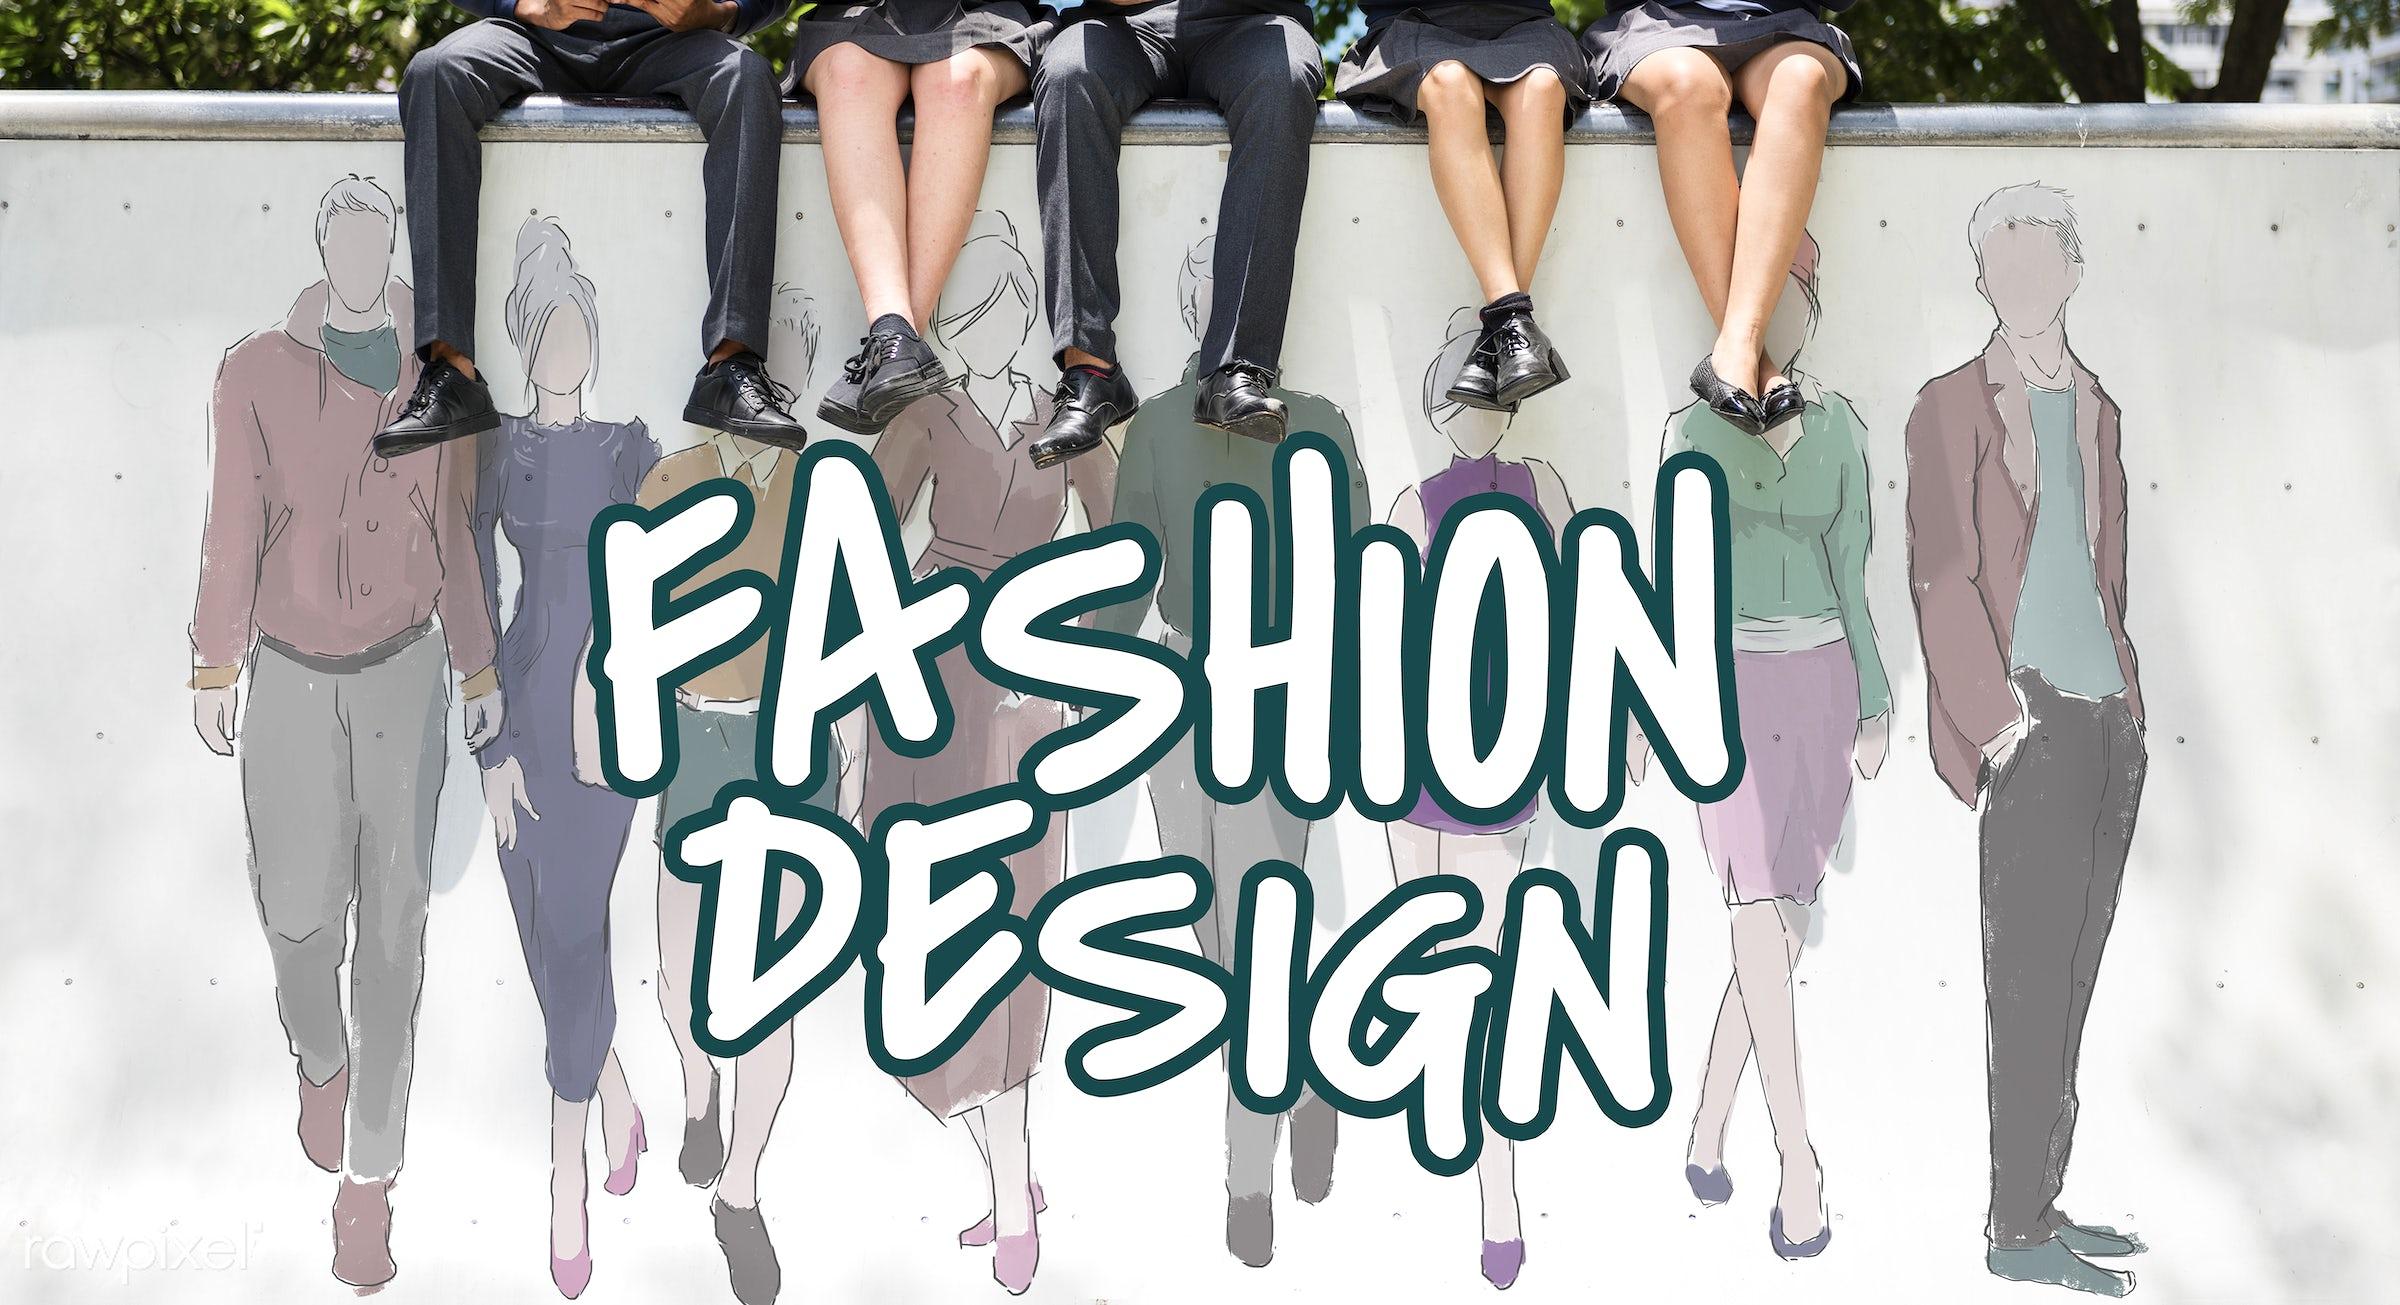 books, chic, class, classy, college, couture, design, designer, diversity, fashion, forecast, friends, friendship, haute,...